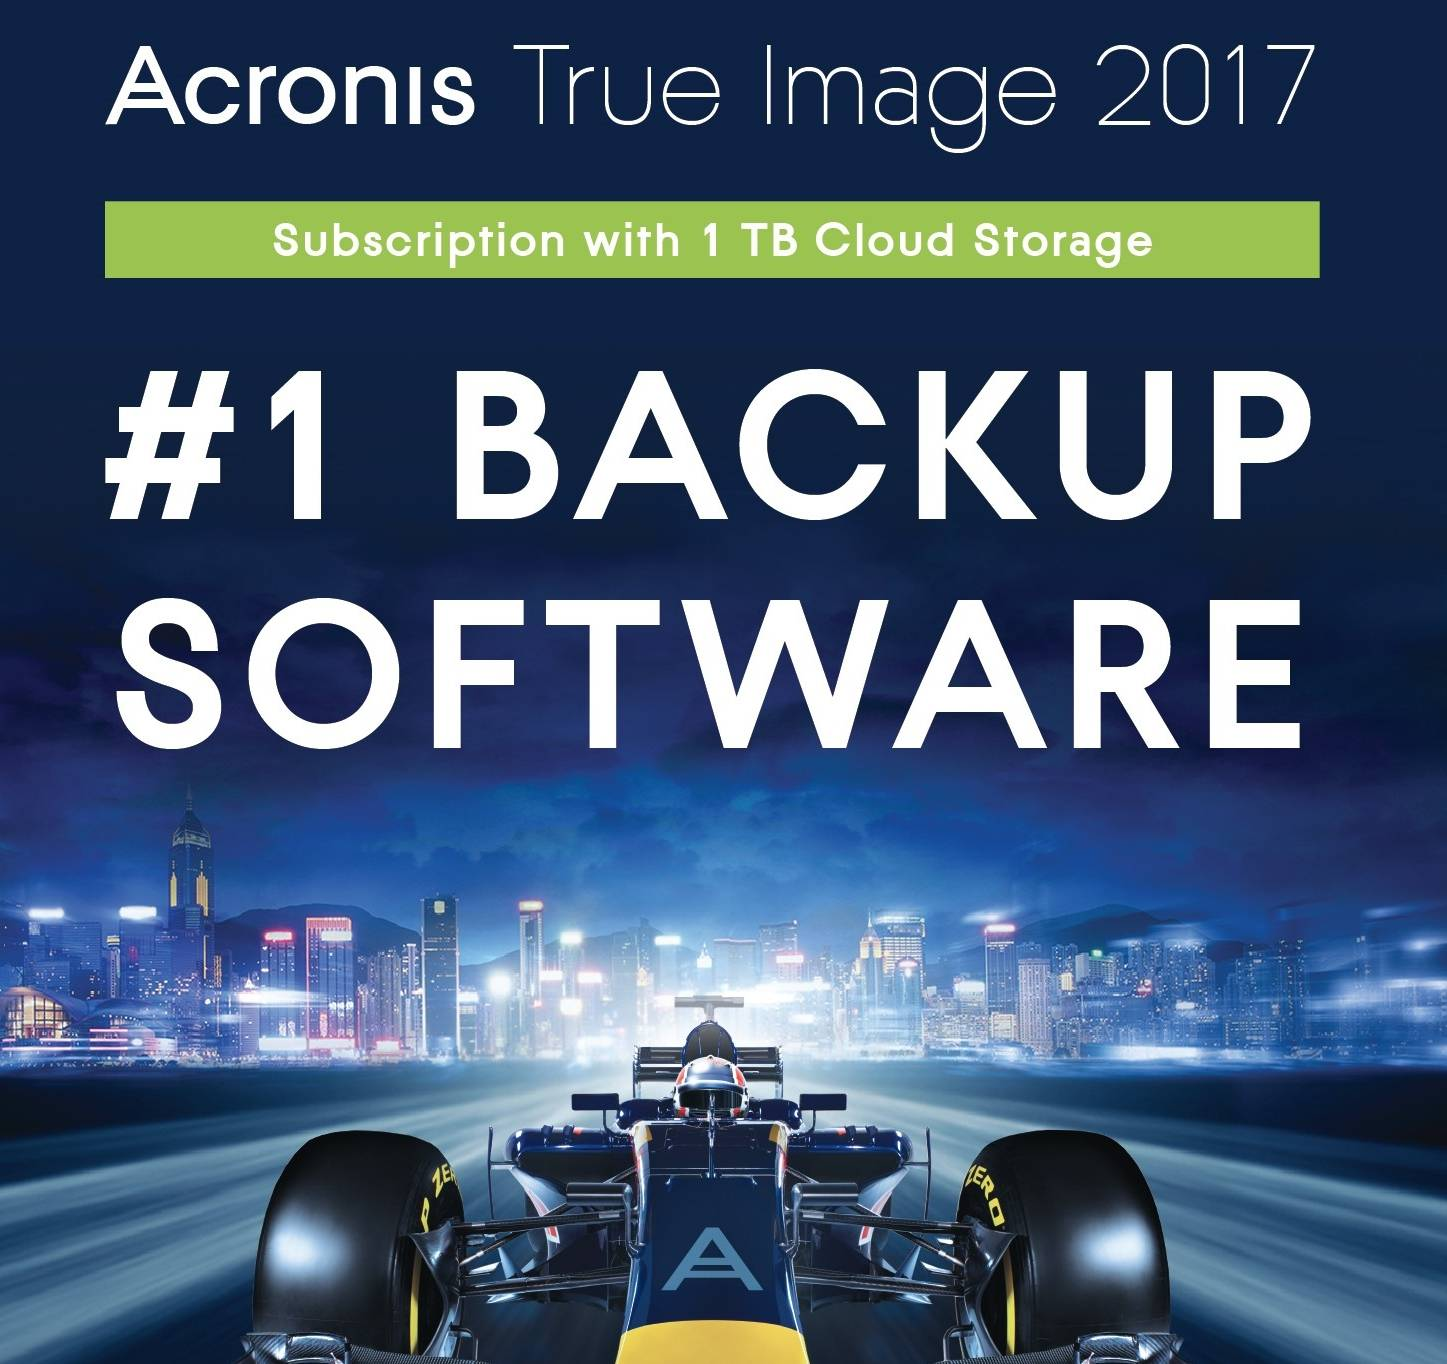 Acronis True image 2017 - Logiciel application - Cybertek.fr - 0